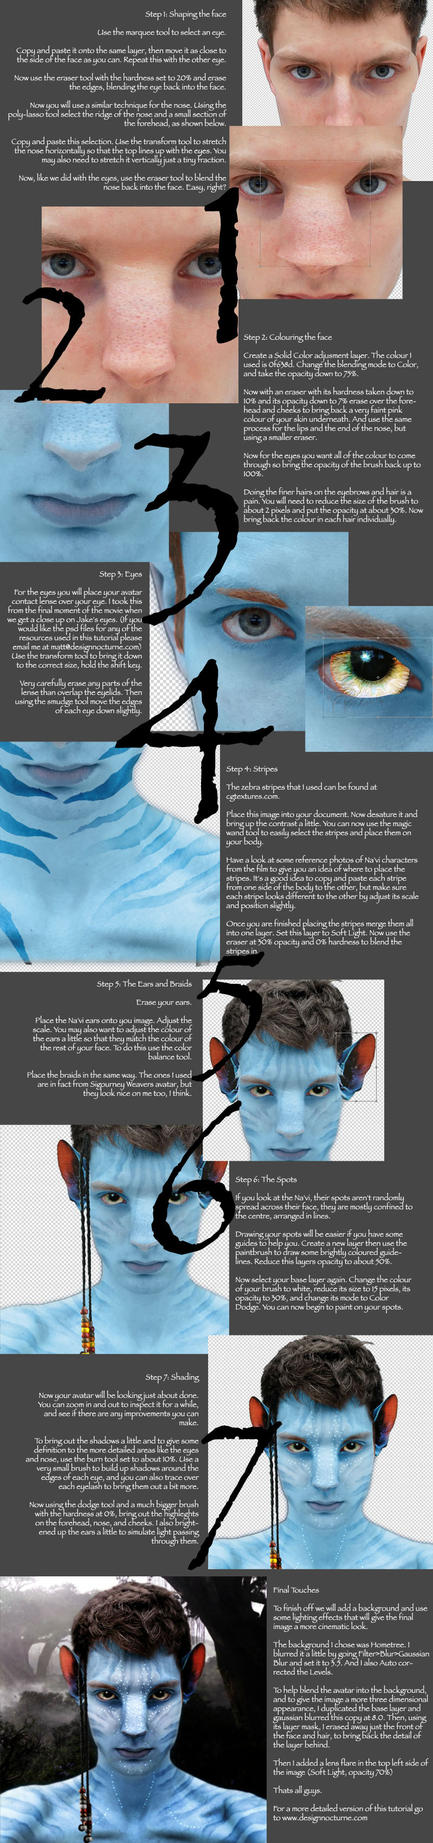 Realistic Avatar Manip by Planet37